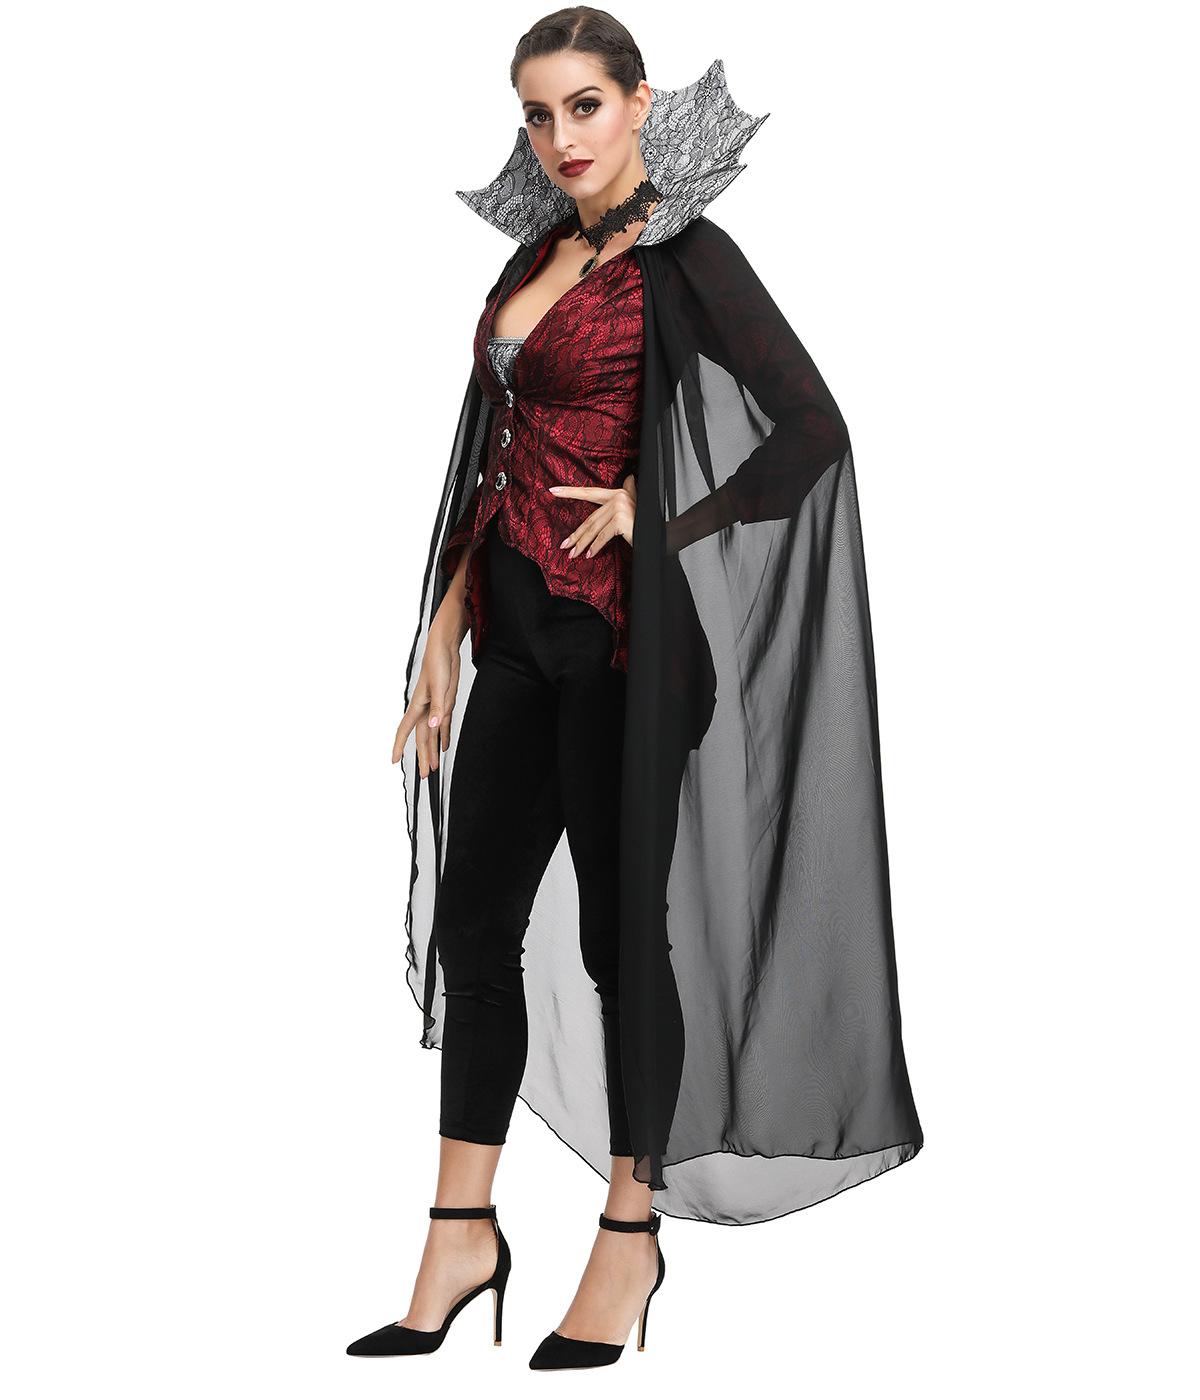 Role play black widow dress Cosplay King costume vampire Devil Halloween Costume European American woman